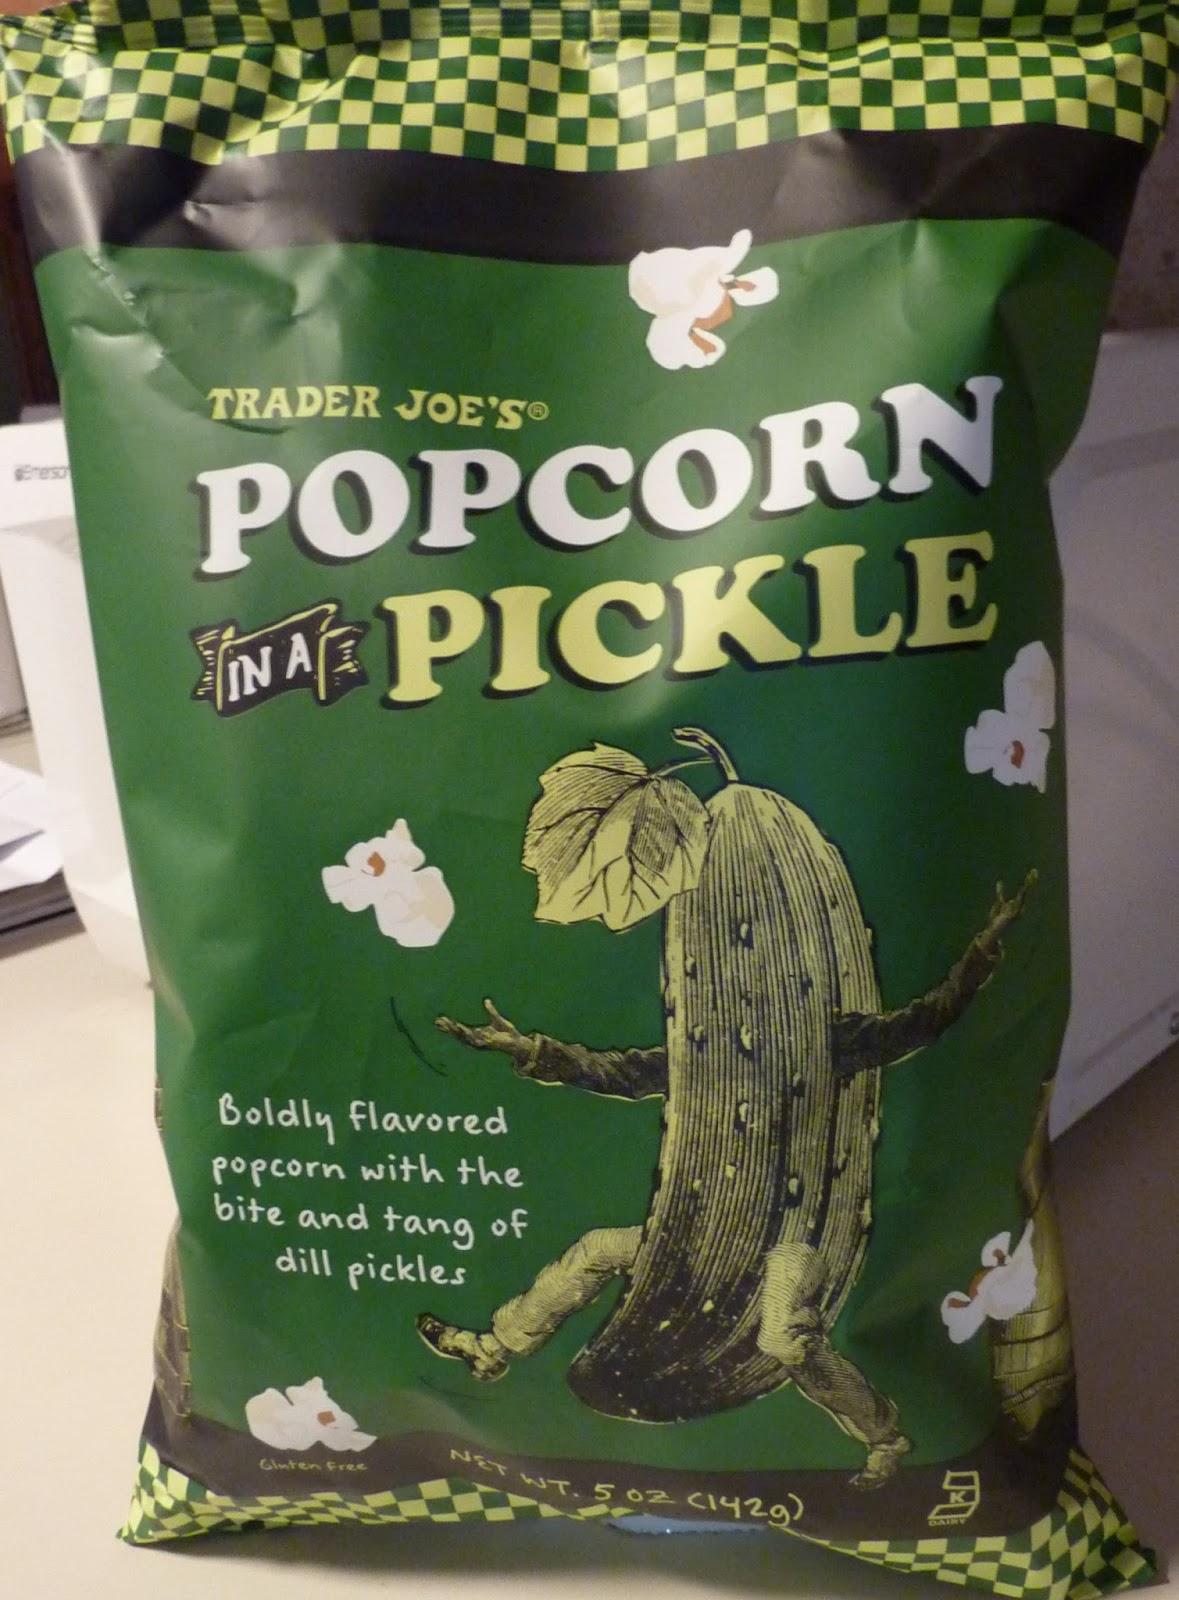 Auu >> What's Good at Trader Joe's?: Trader Joe's Popcorn in a Pickle